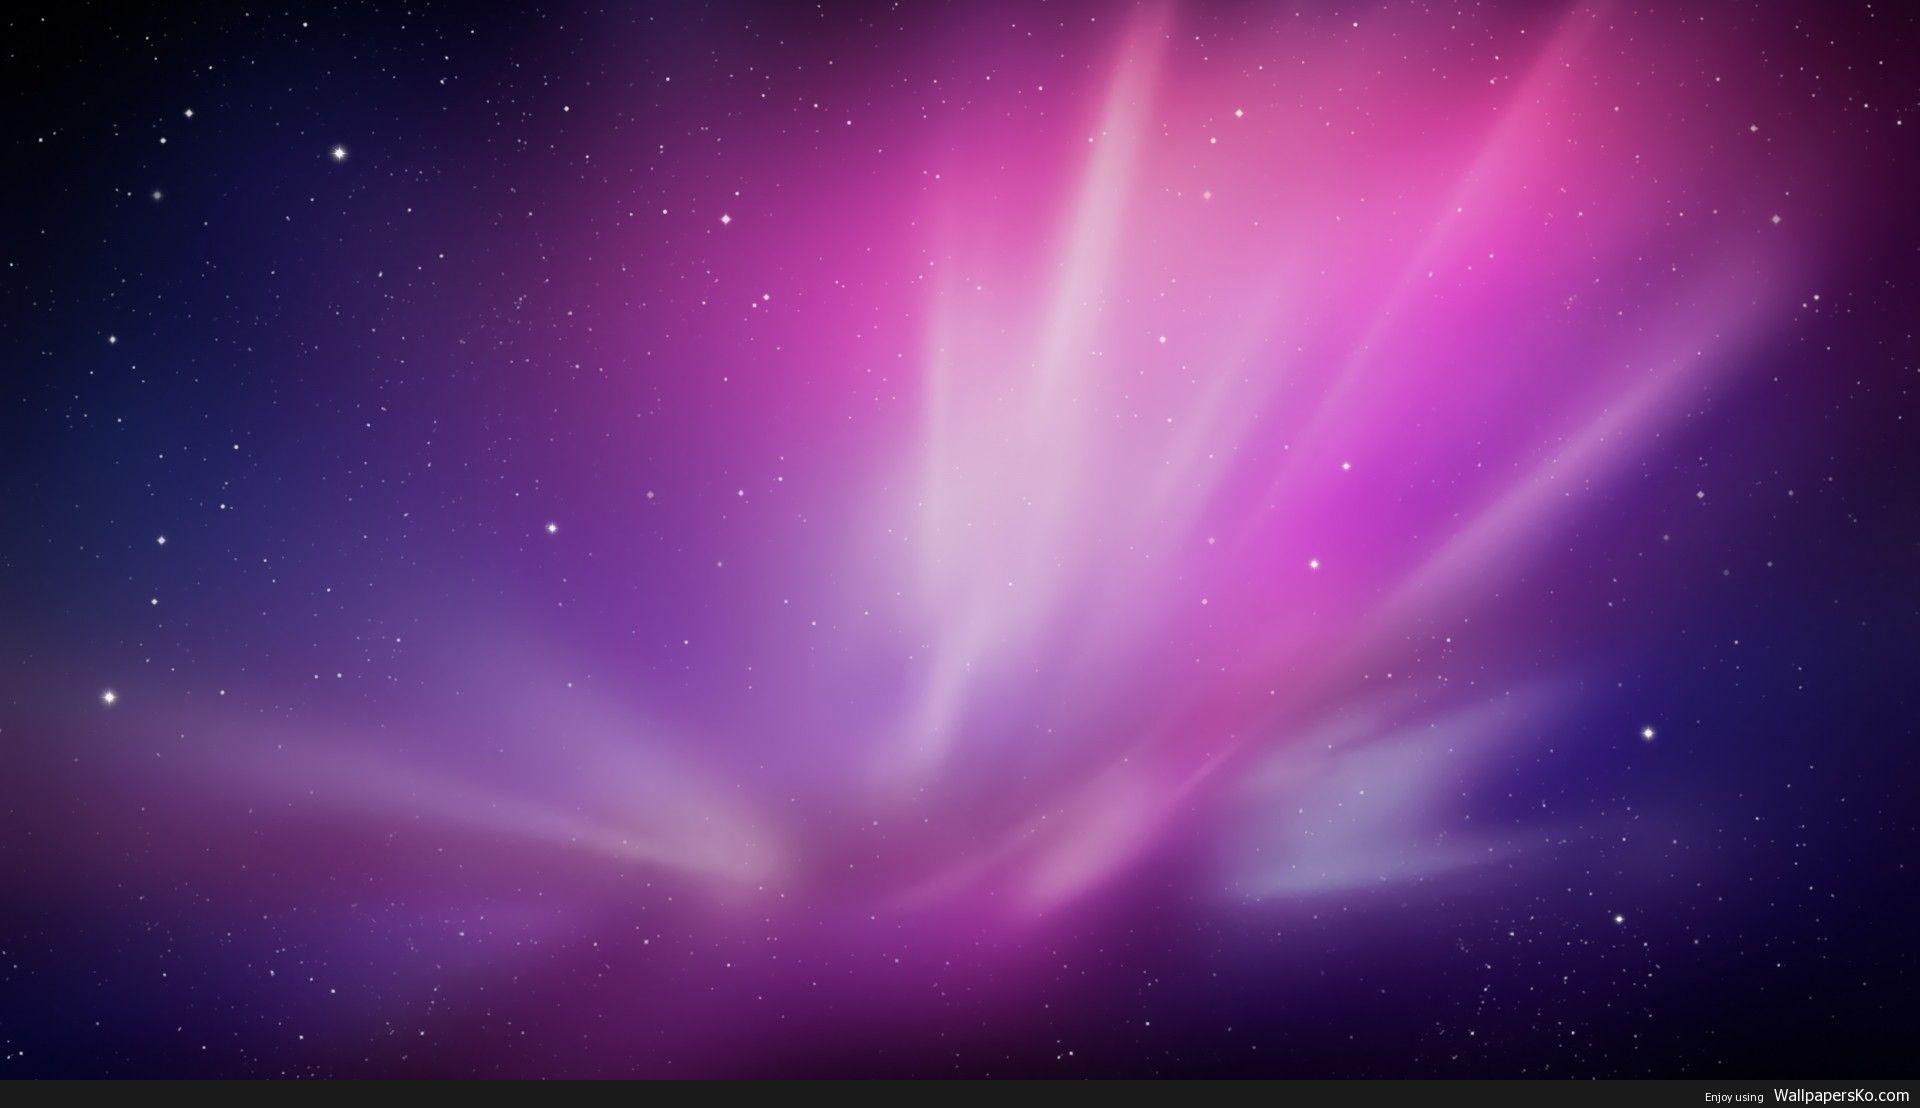 How to turn on Dynamic Desktop in macOS Mojave